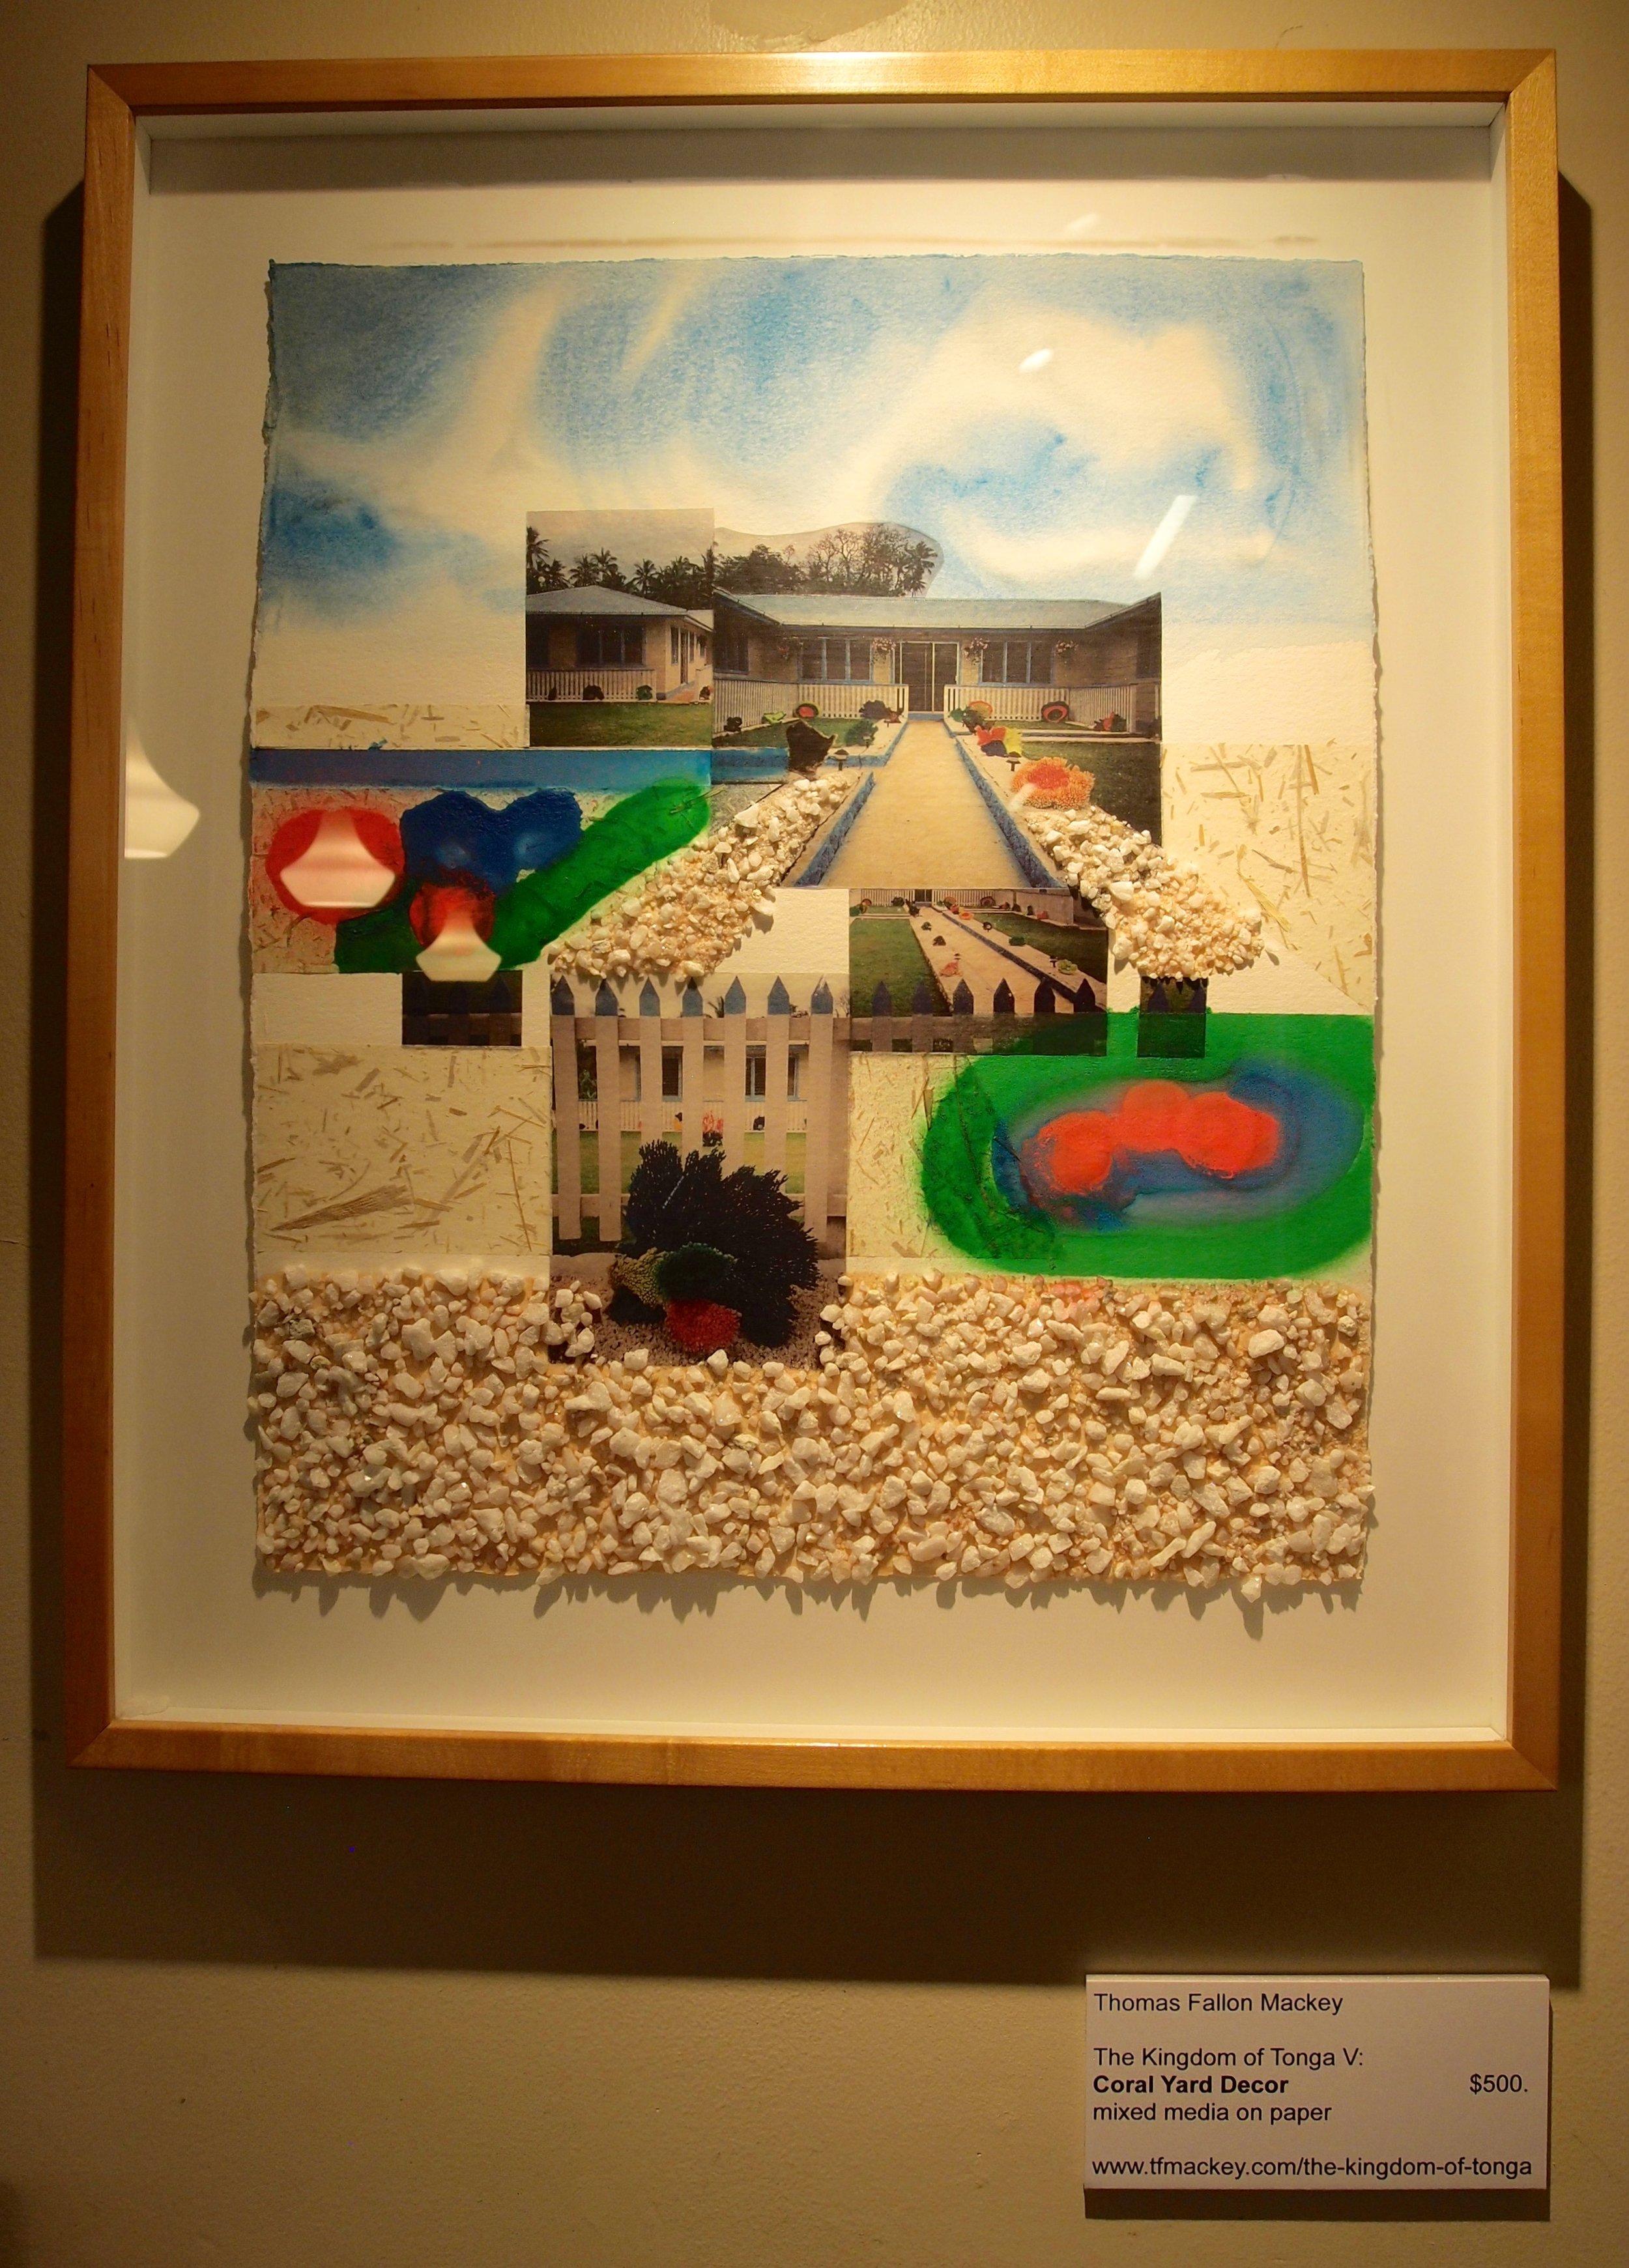 "The Kingdom of Tonga V: Coral Yard Decor  mixed media on paper (23 x 20"")"